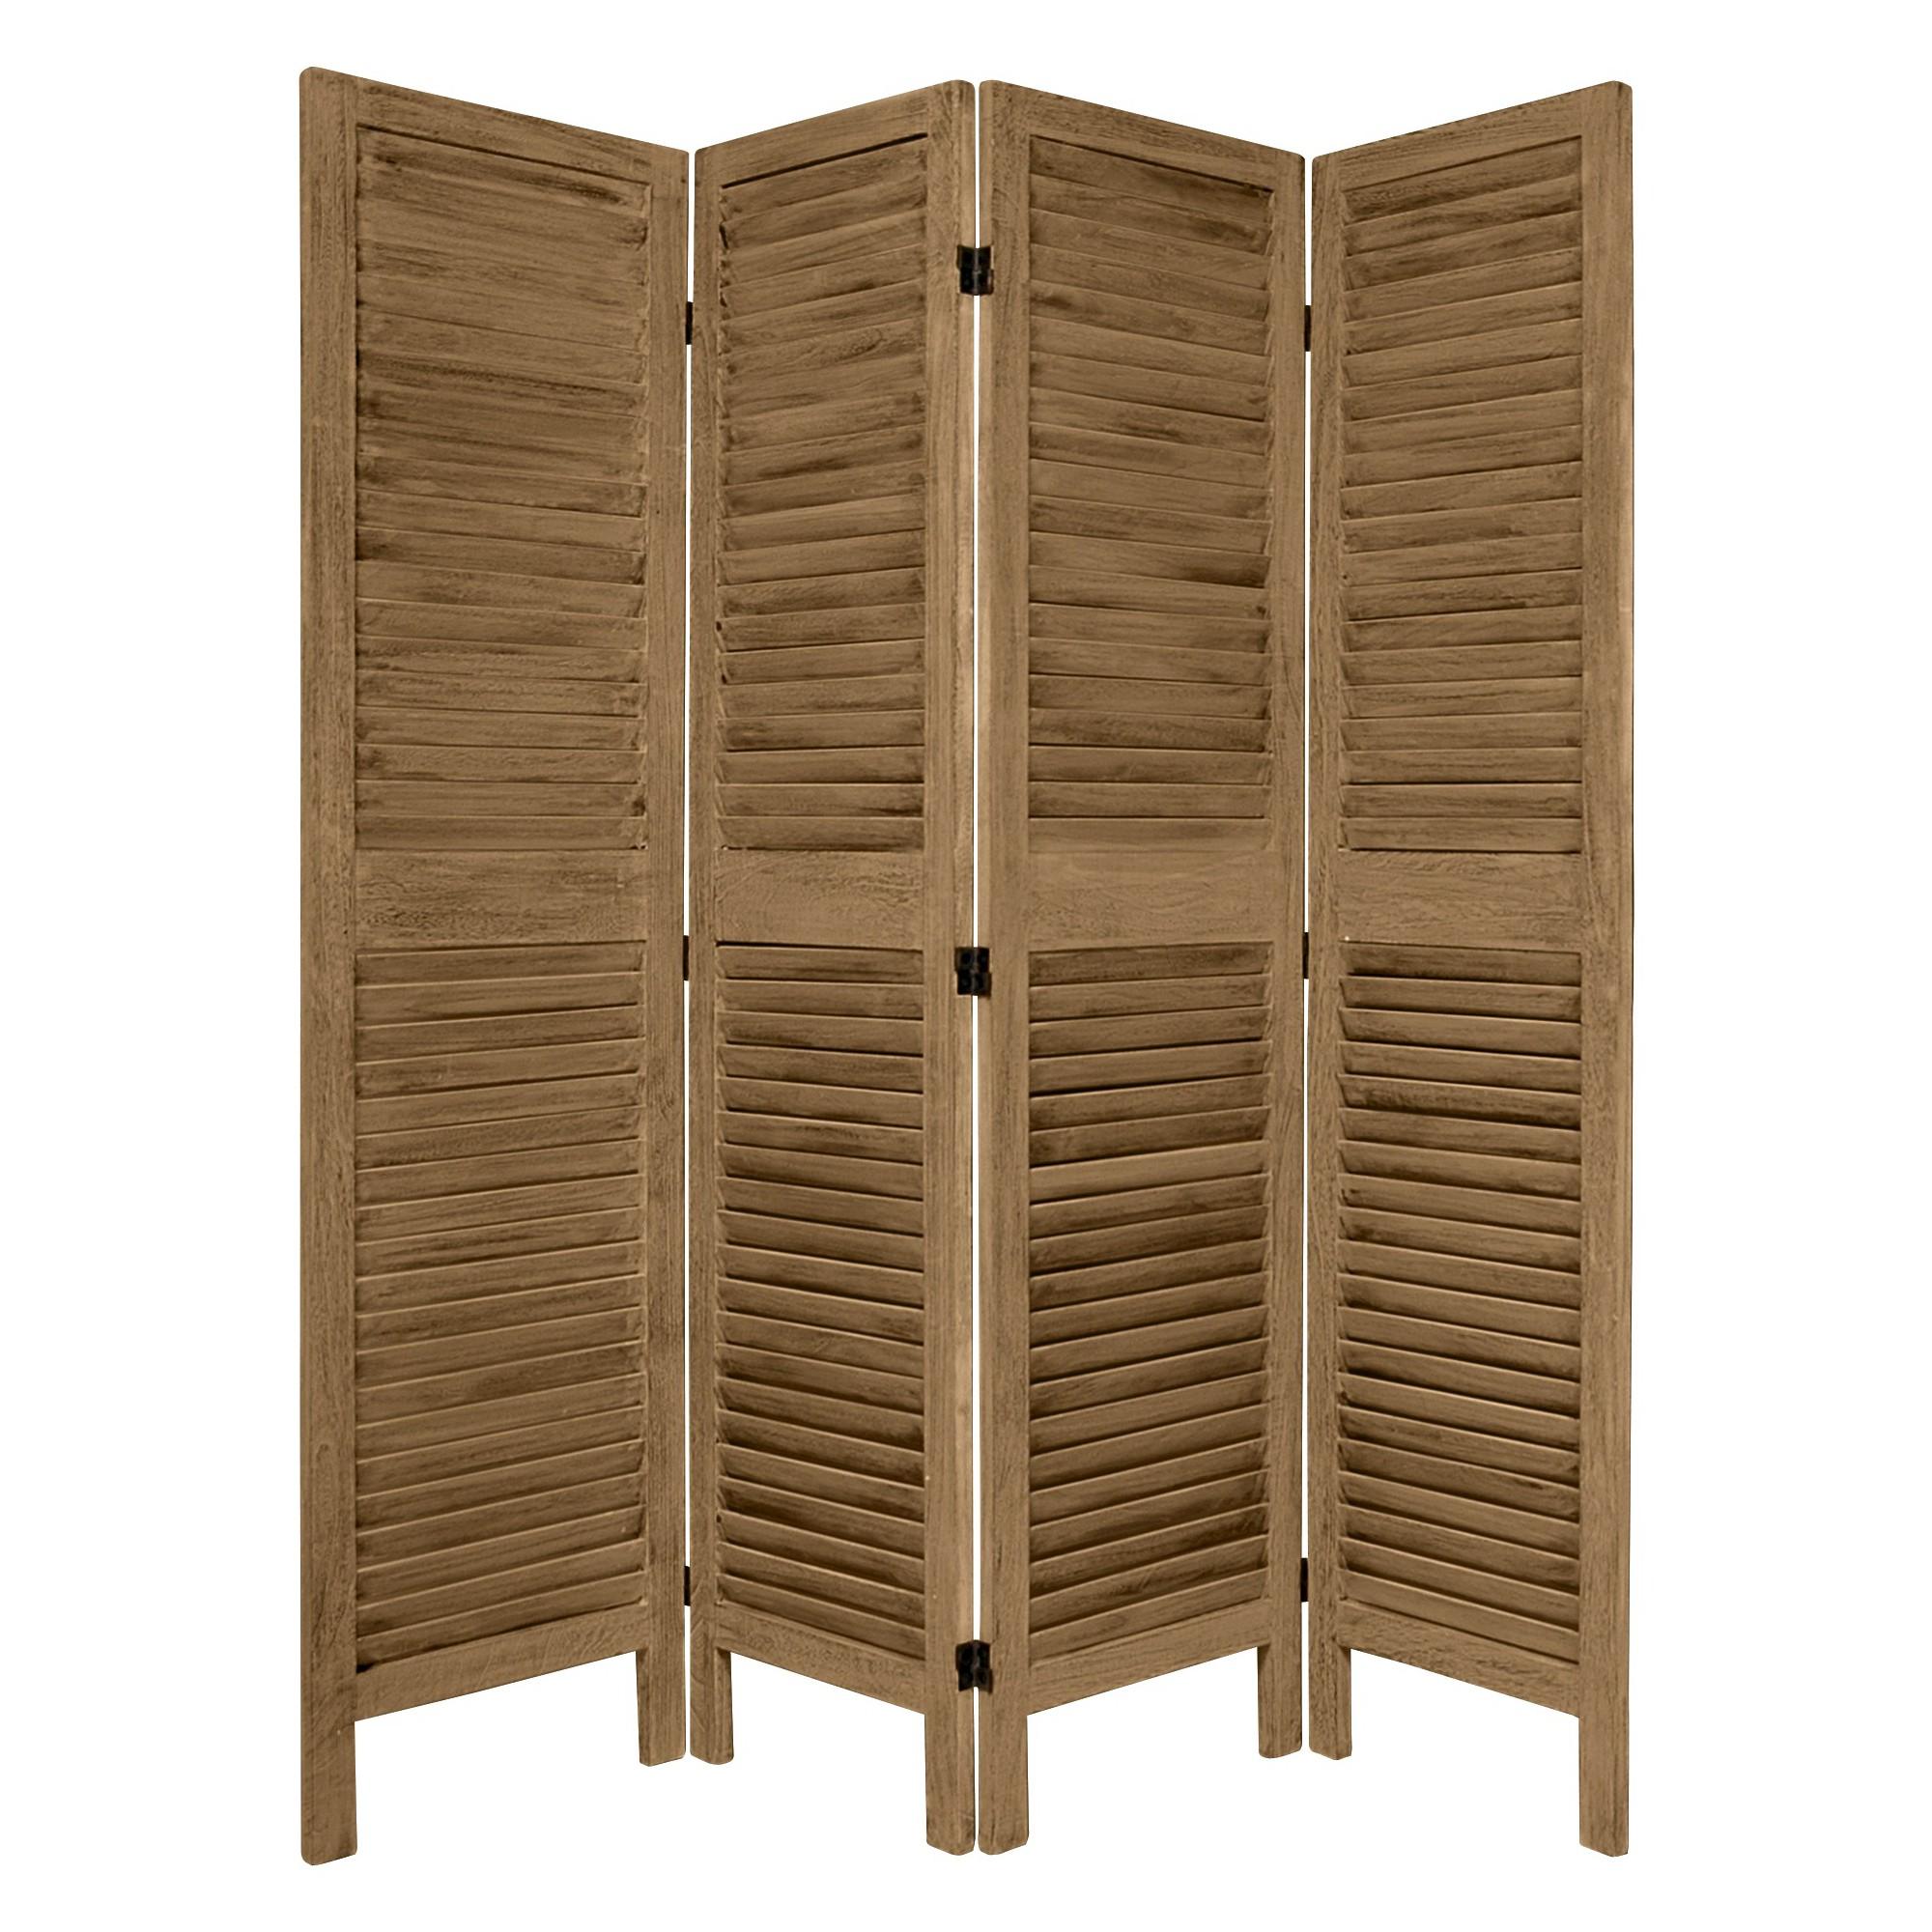 5 1 2 Ft Tall Classic Venetian Room Divider 3 Panel Wood Room Divider Temporary Room Dividers Folding Room Dividers